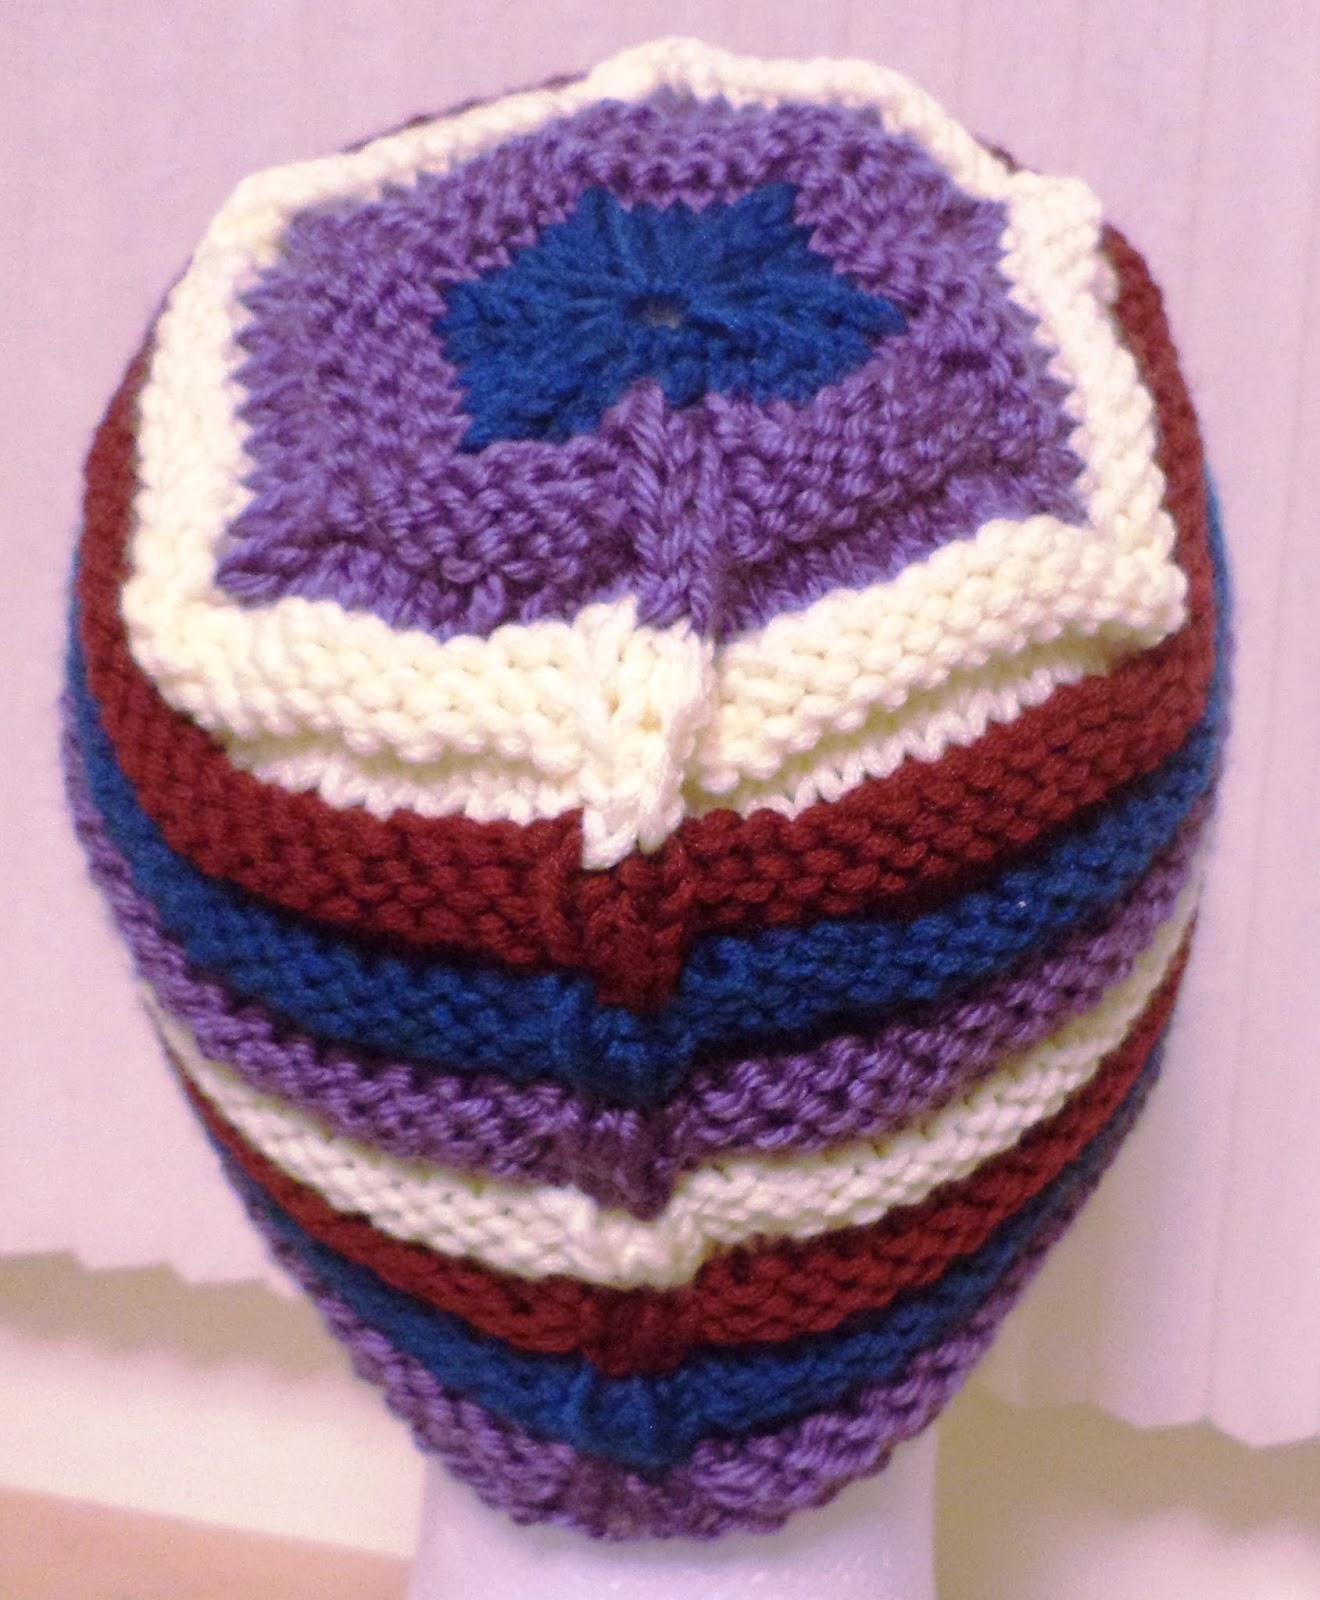 Enchanting Knitting Pattern Central.com Composition - Blanket ...